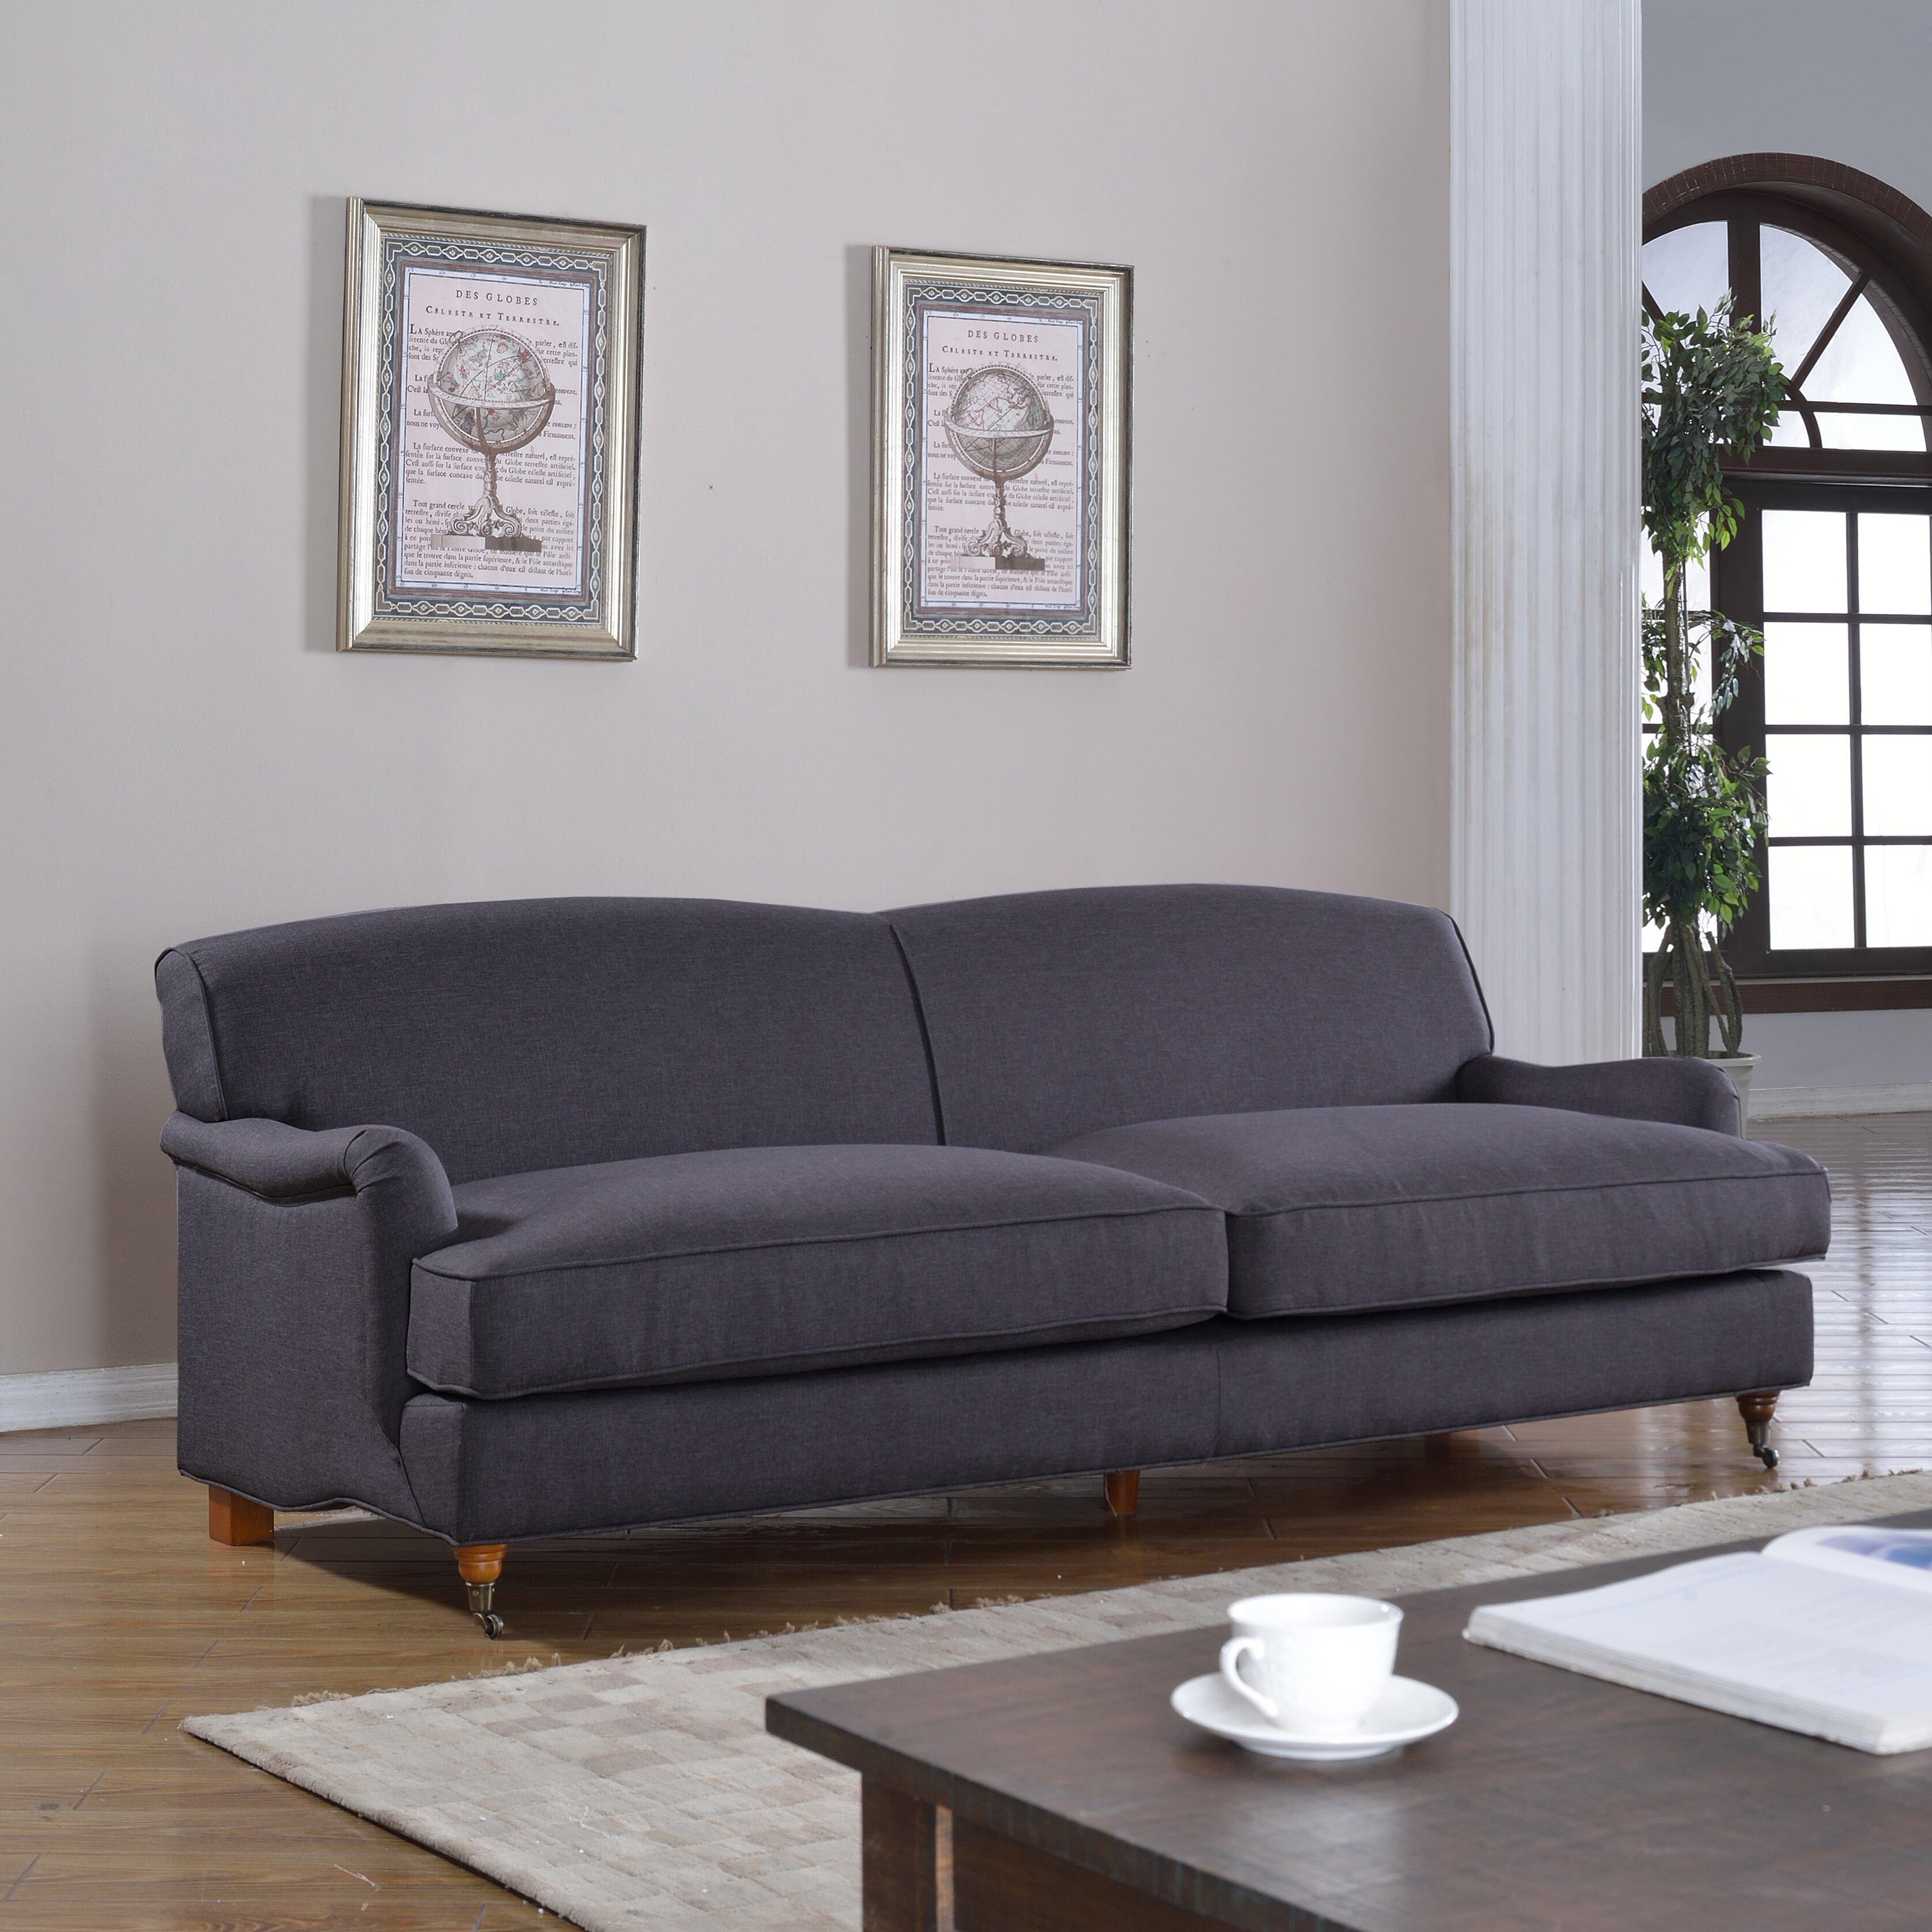 Mid Century Modern Sofas: Madison Home USA Mid-Century Modern Large Sofa With